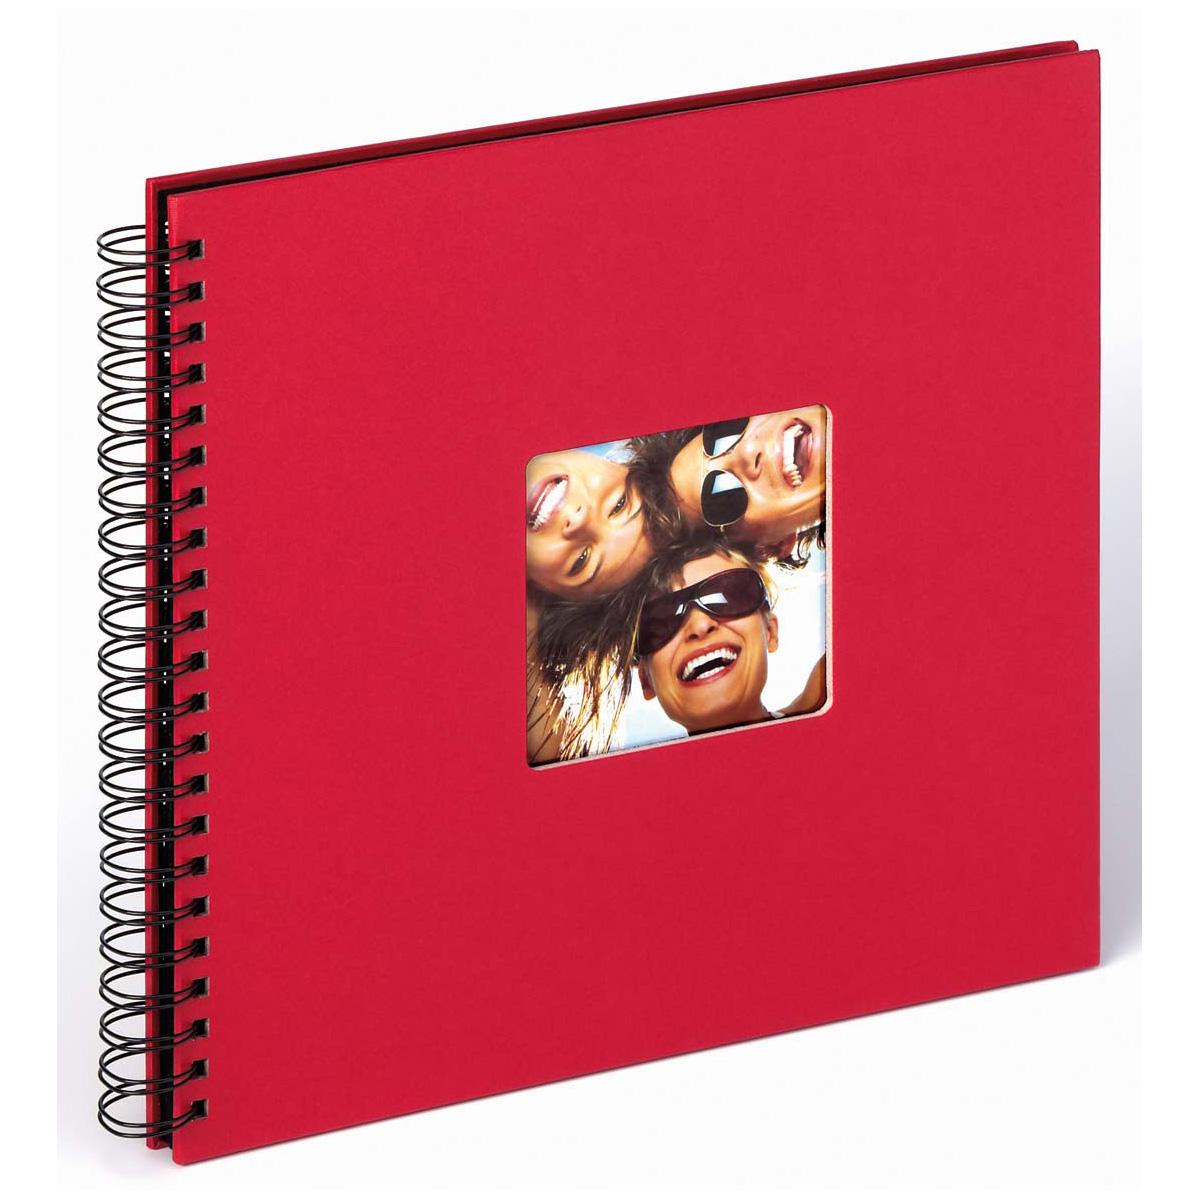 Rotes Fotoalbum mit Spiralbindung